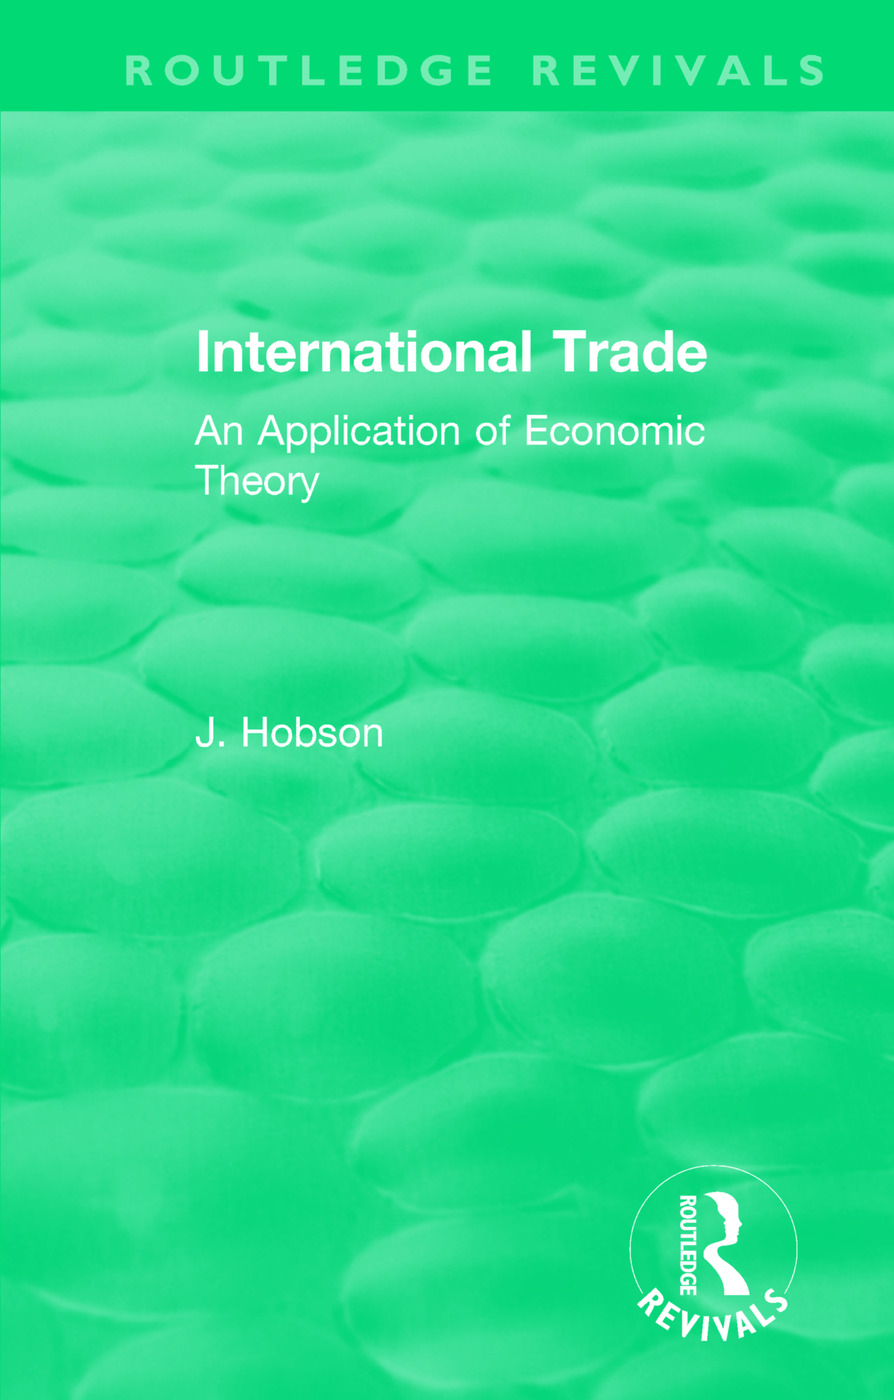 International Trade (Routledge Revivals)